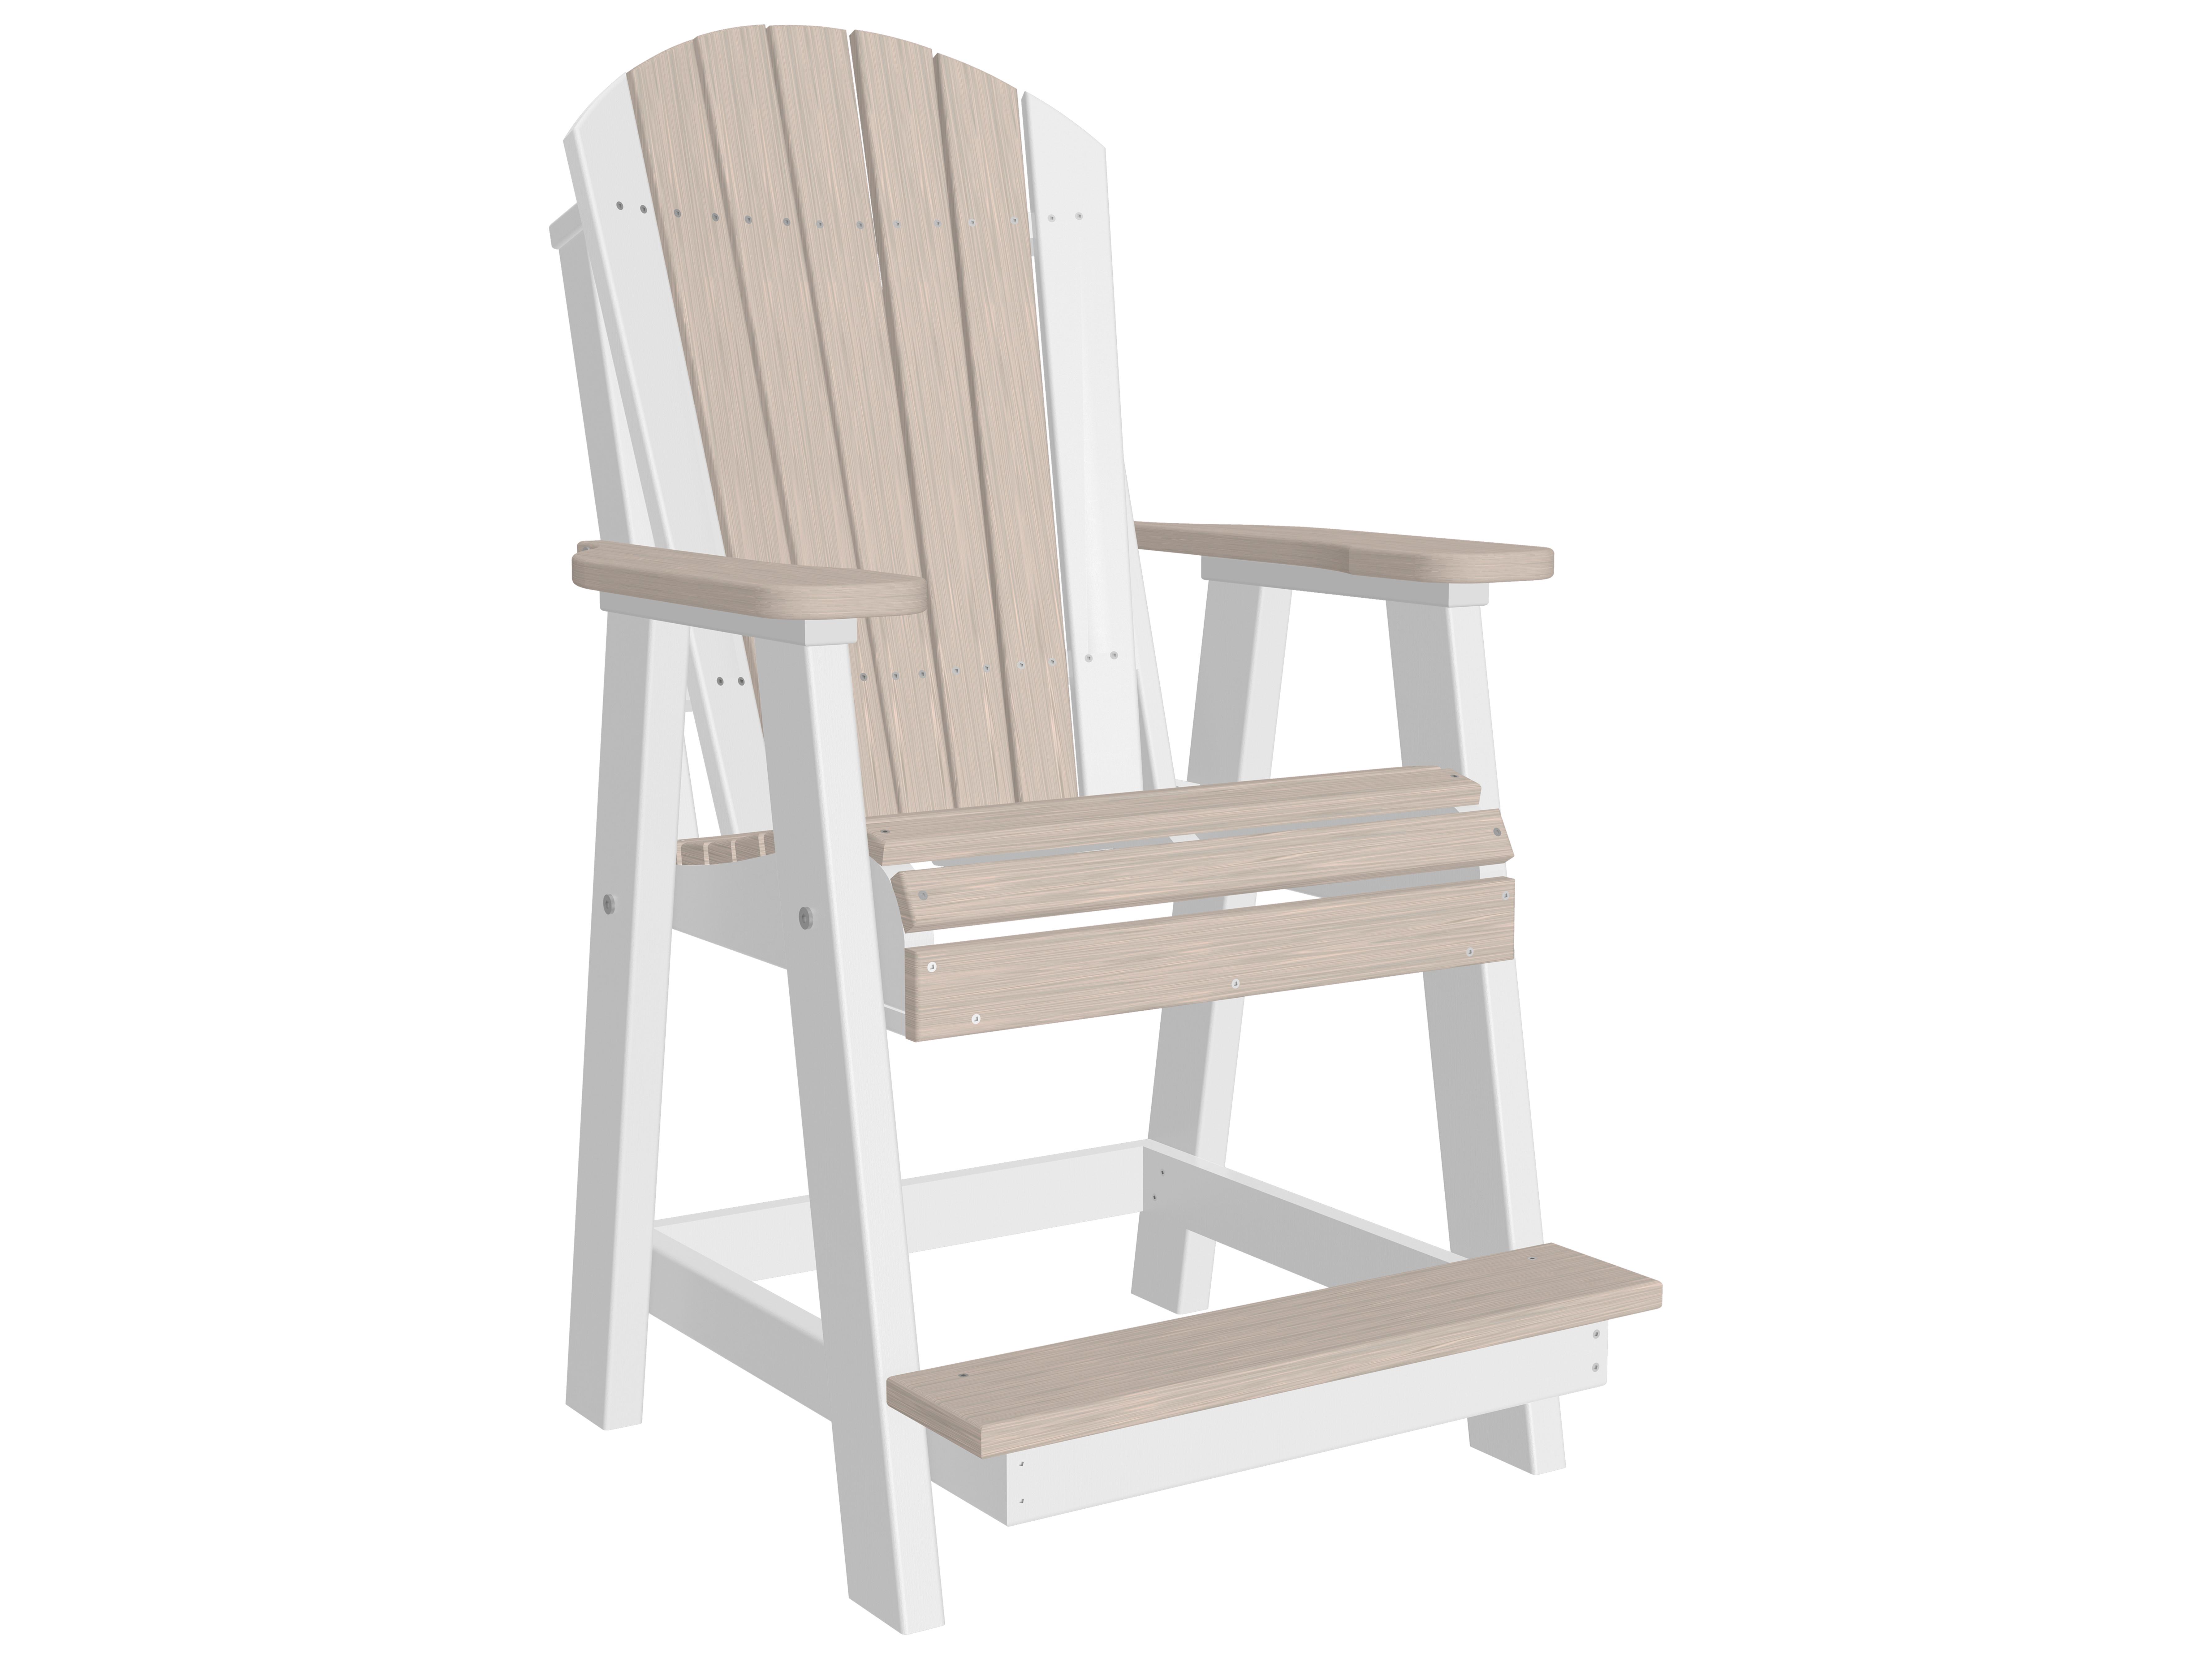 Luxcraft Recycled Plastic Adirondack Balcony Chair Pabc